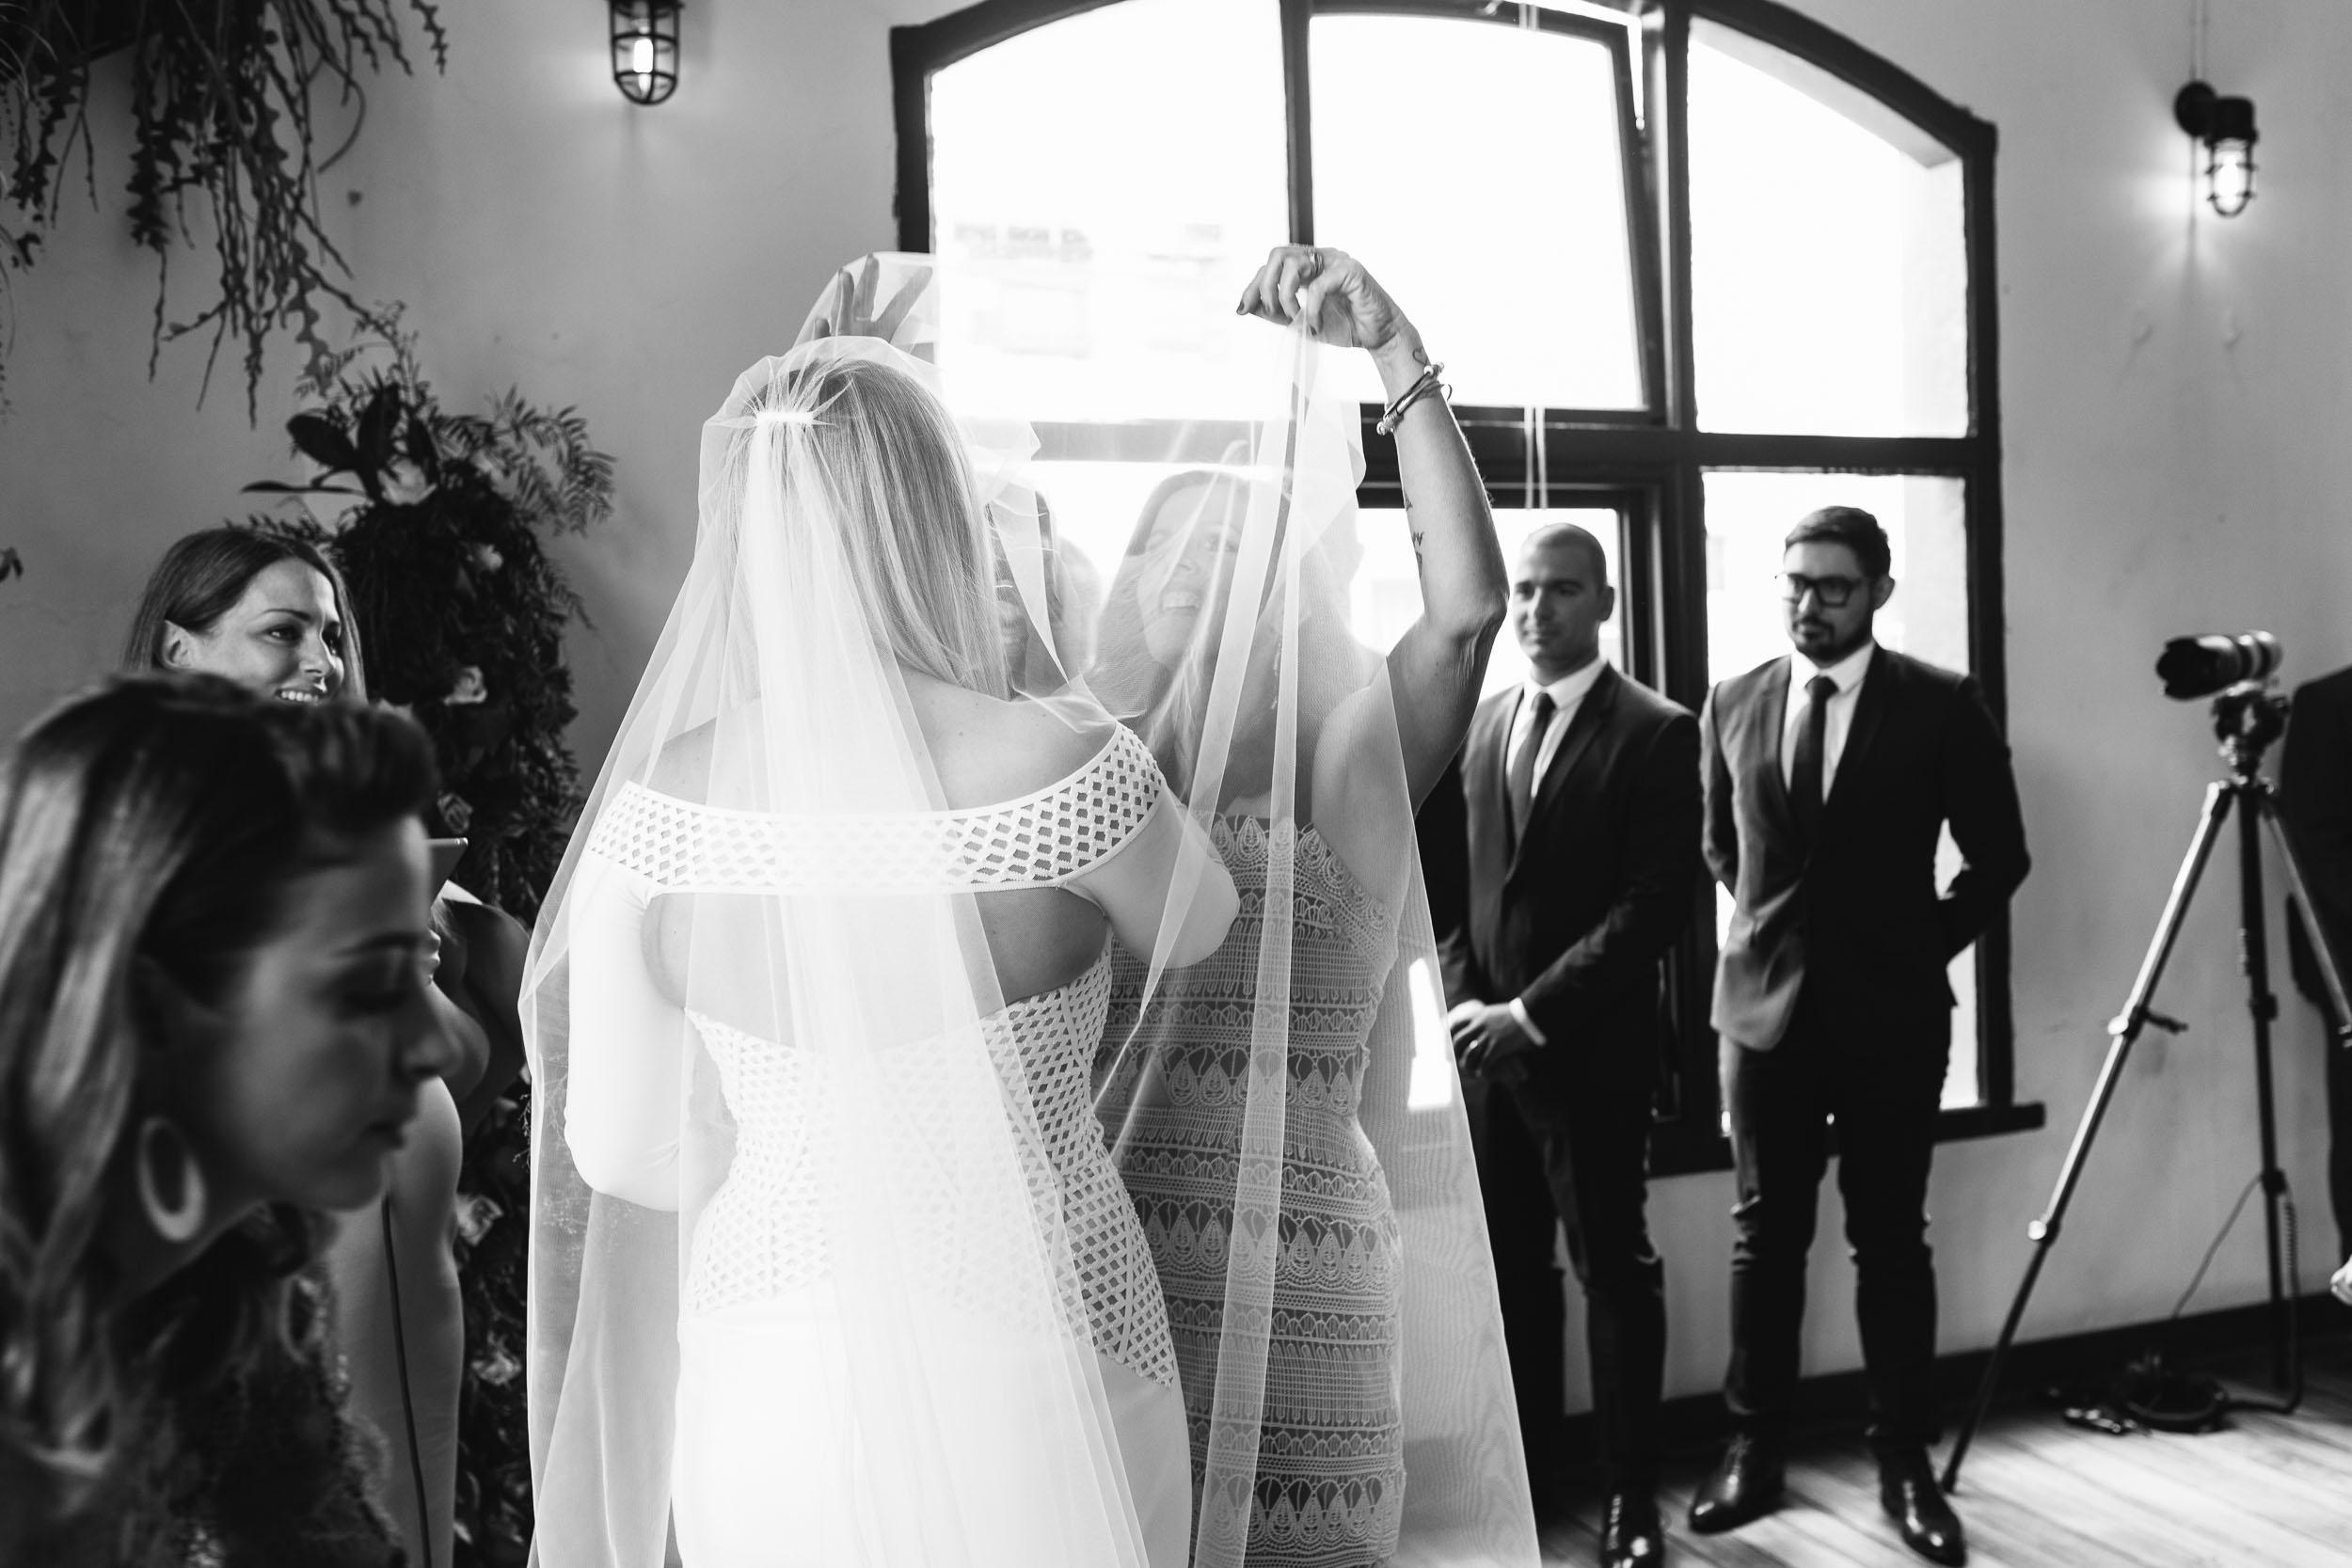 Kas-Richards-Urban-Melbourne-Wedding-Jason-Grech-264.jpg